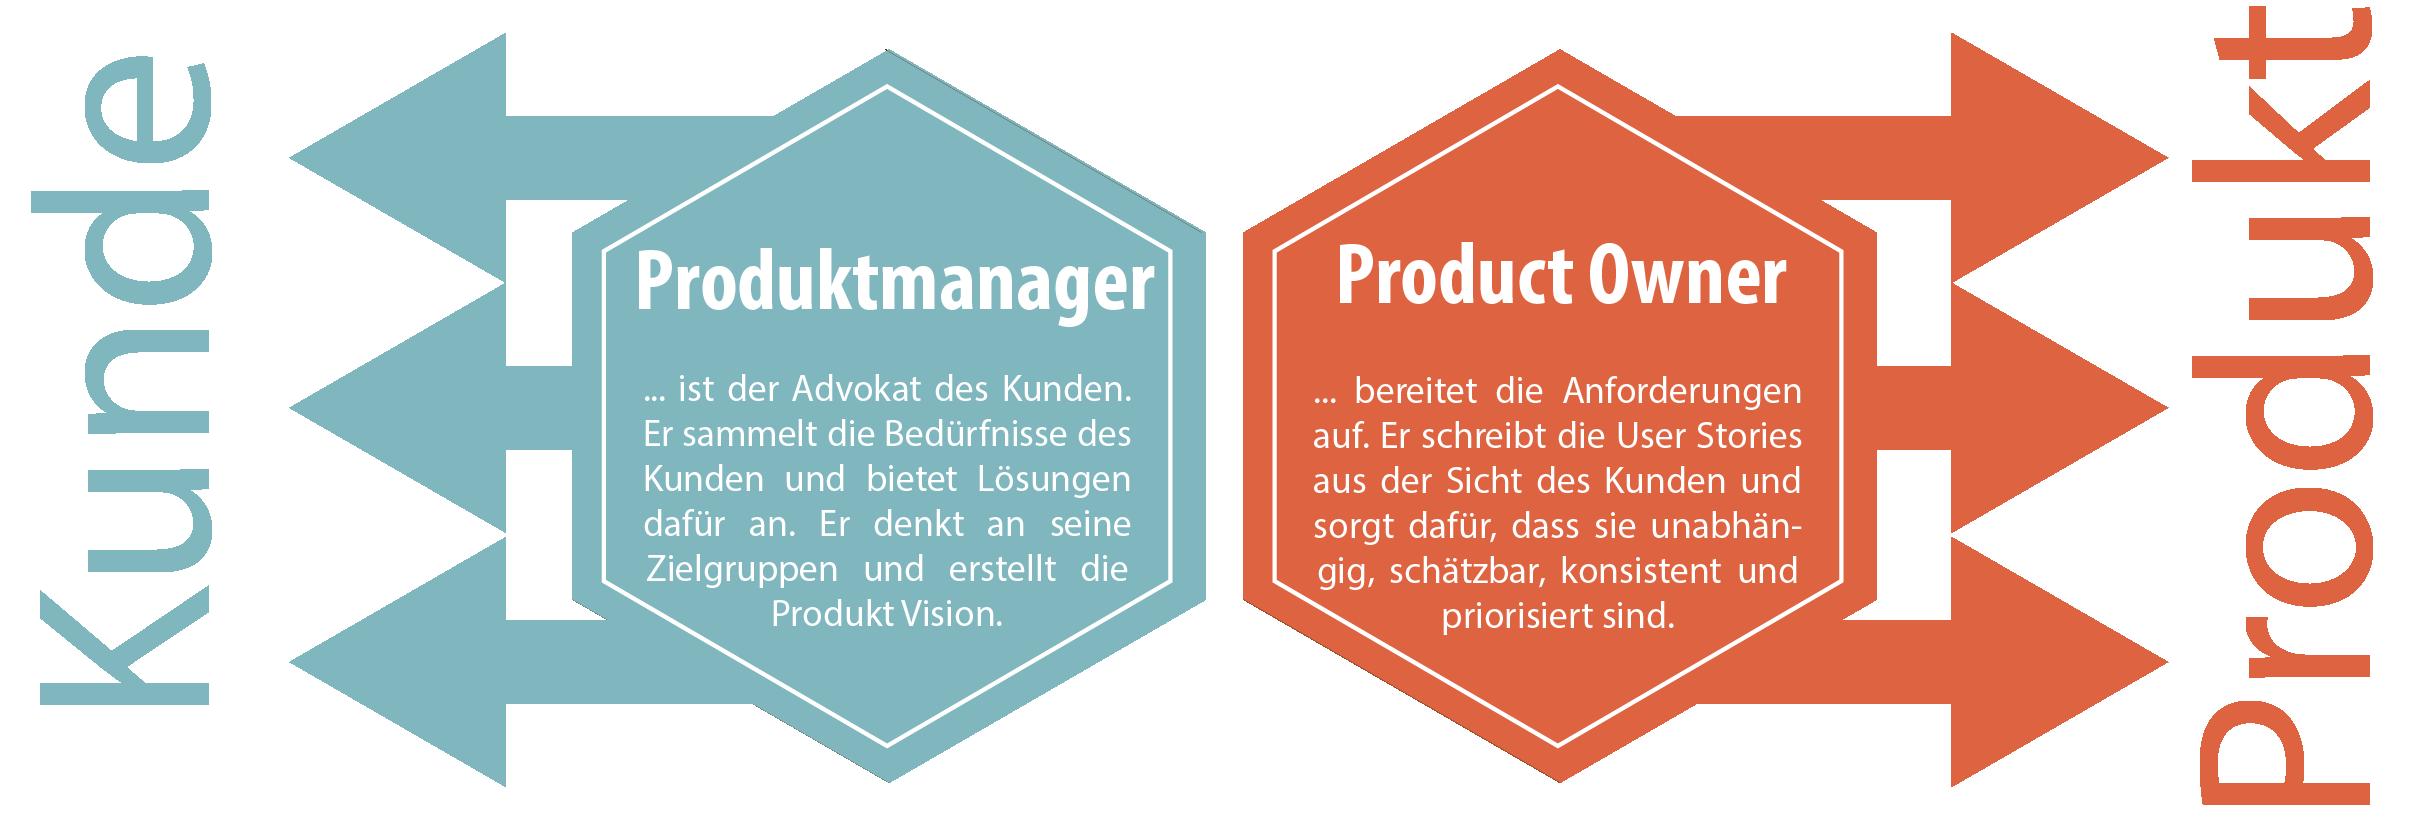 PMvsPO Customer Centric vs Product Centric